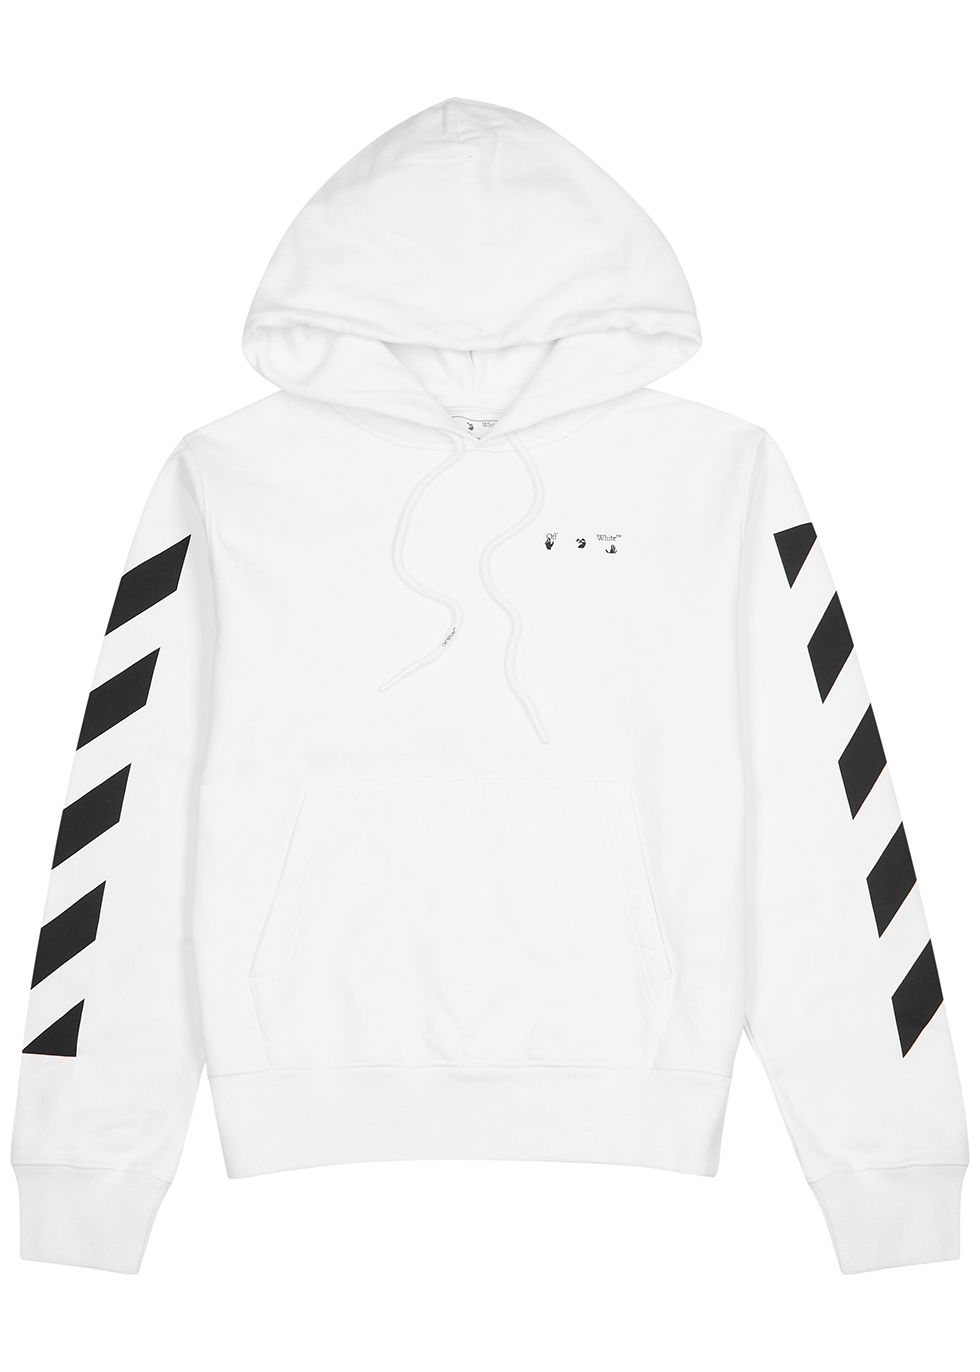 Pencil Arch printed hooded cotton sweatshirt